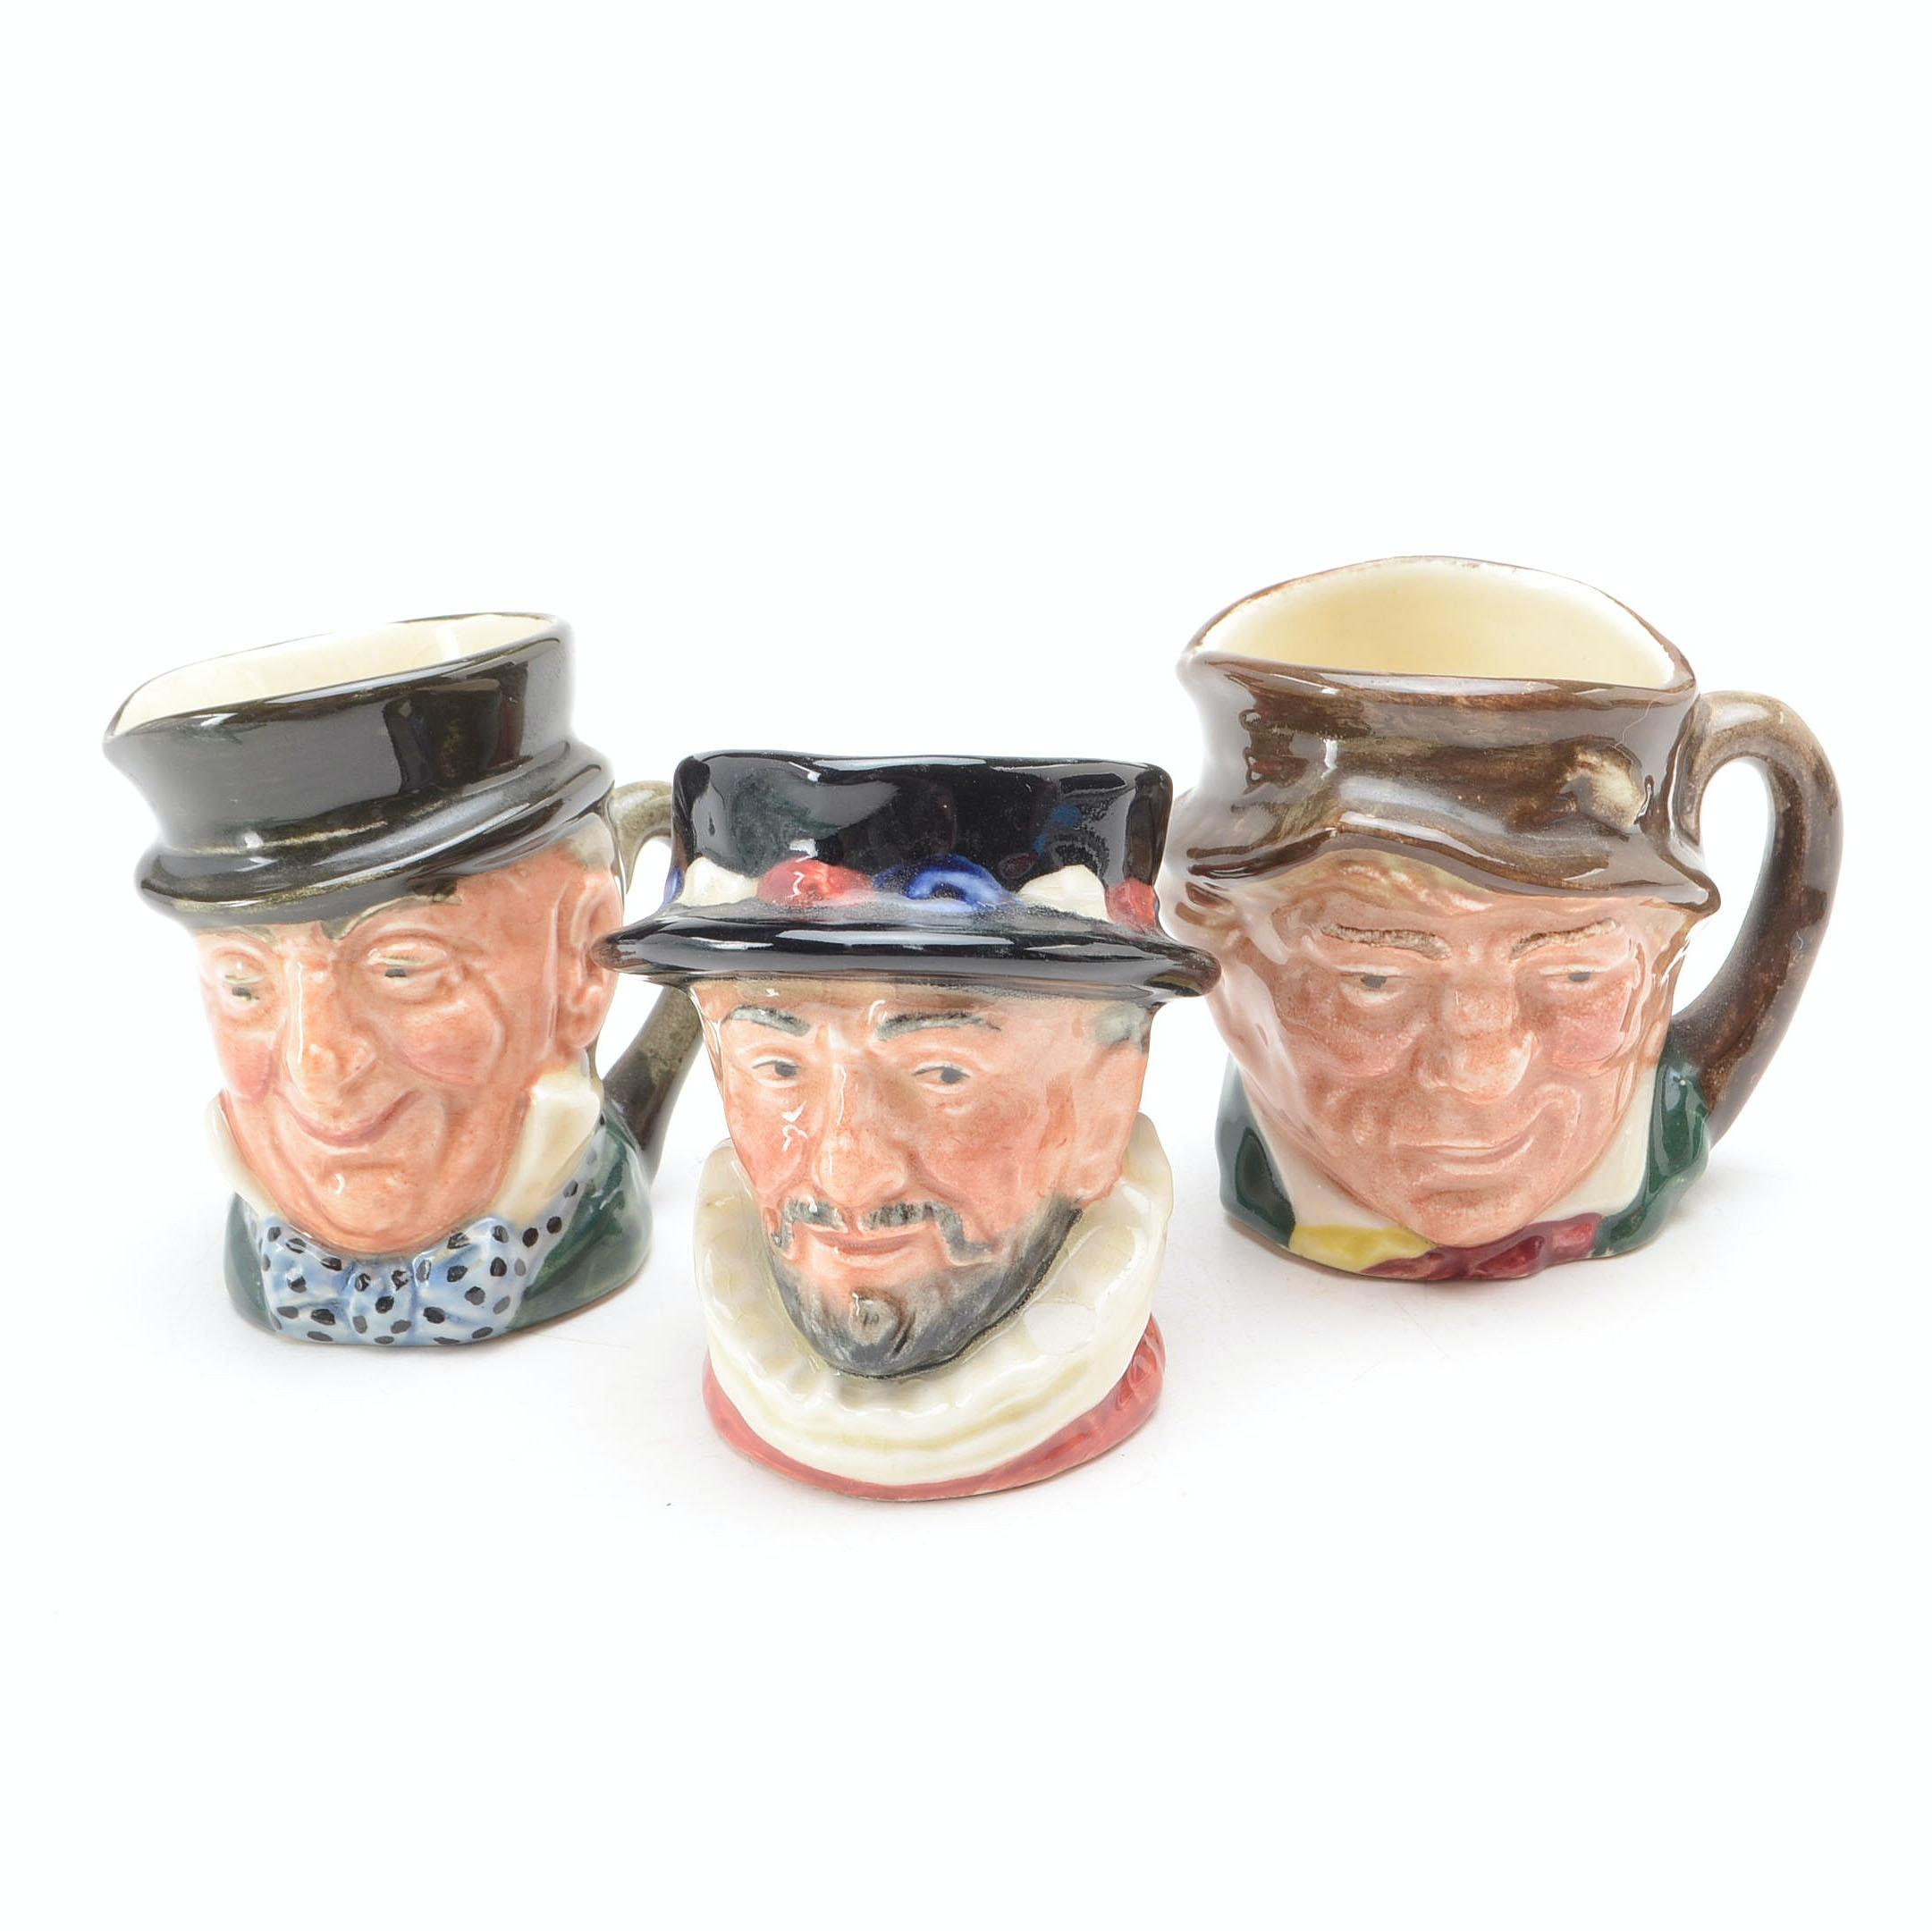 Small Group of Miniature Royal Doulton Toby Mugs